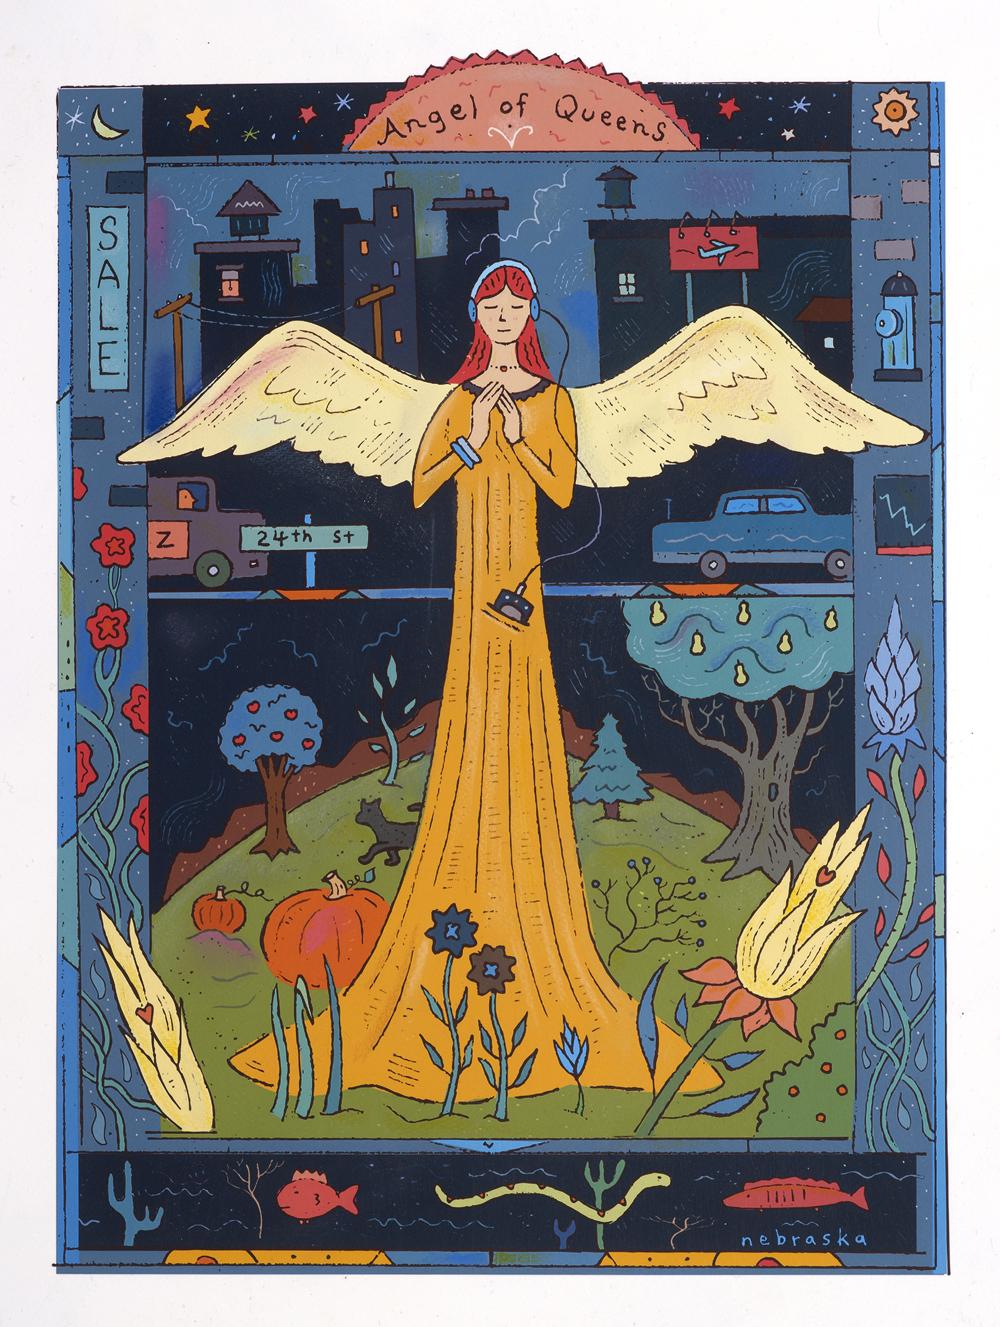 Angel of Queens $400 unframed / $600 framed